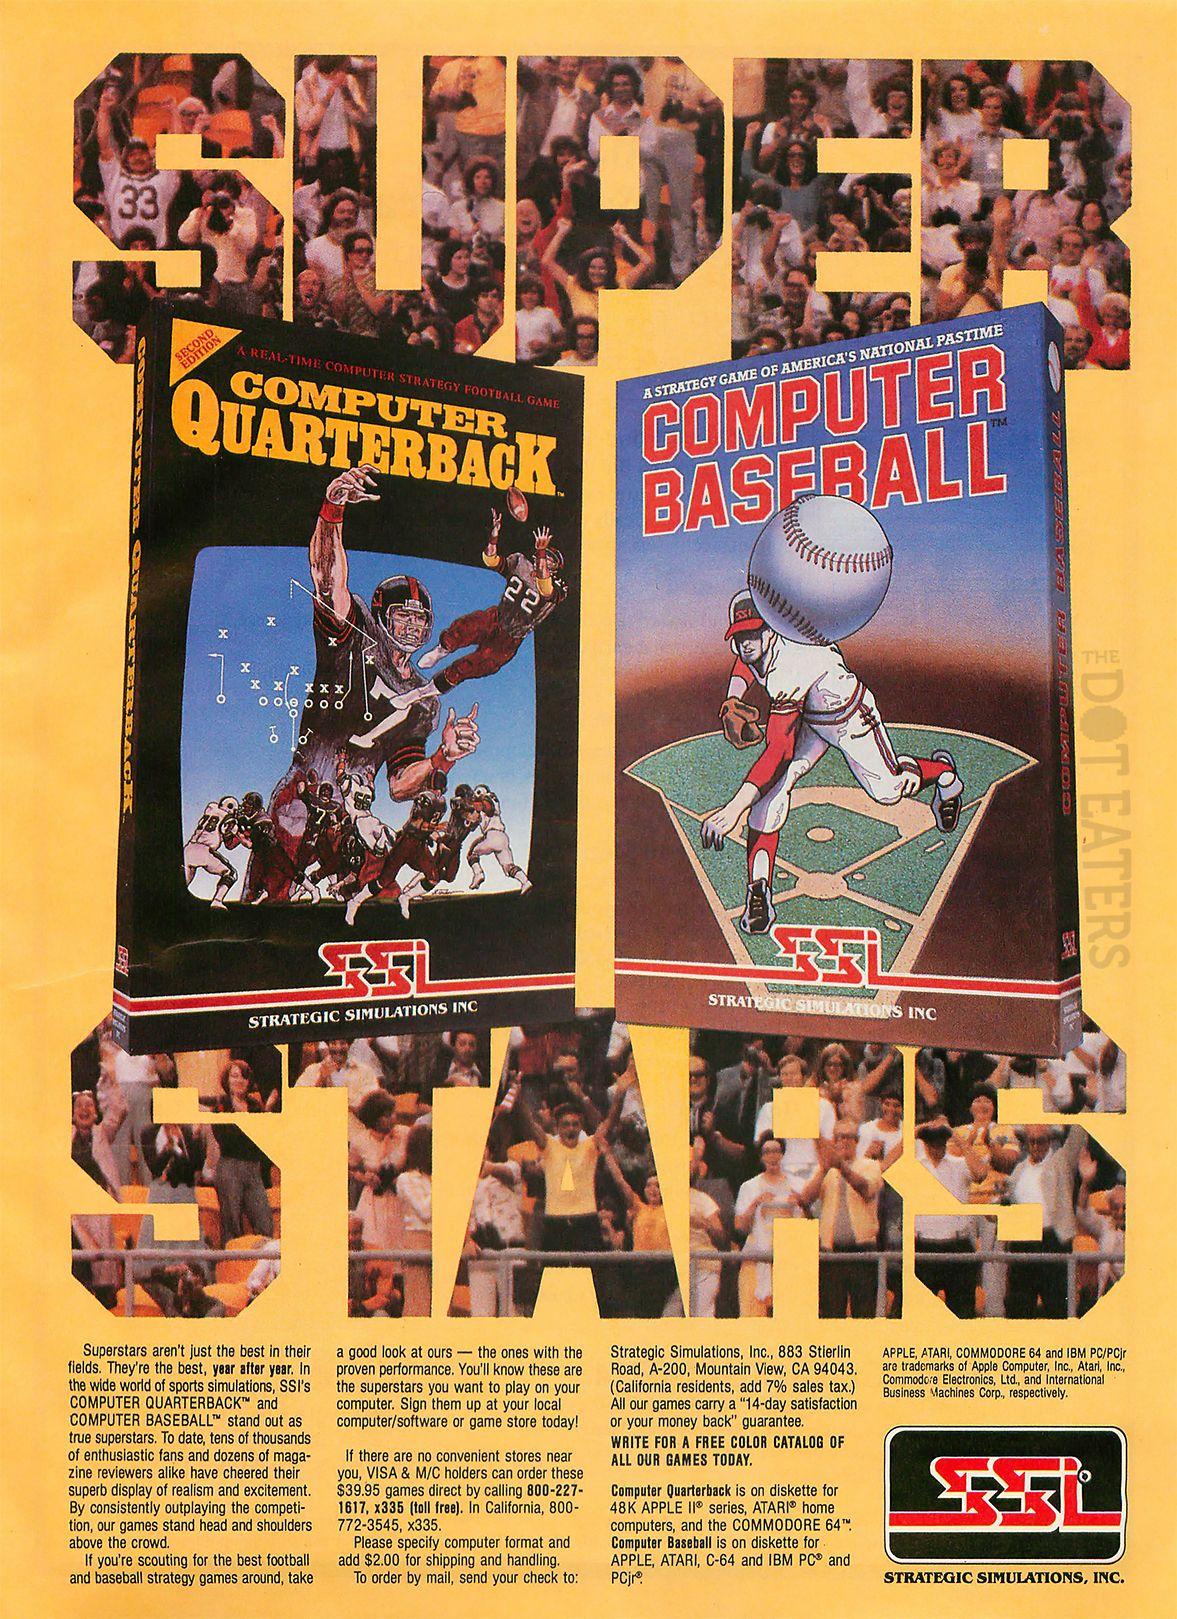 Computer Quarterback, an early game by M.U.L.E. creator